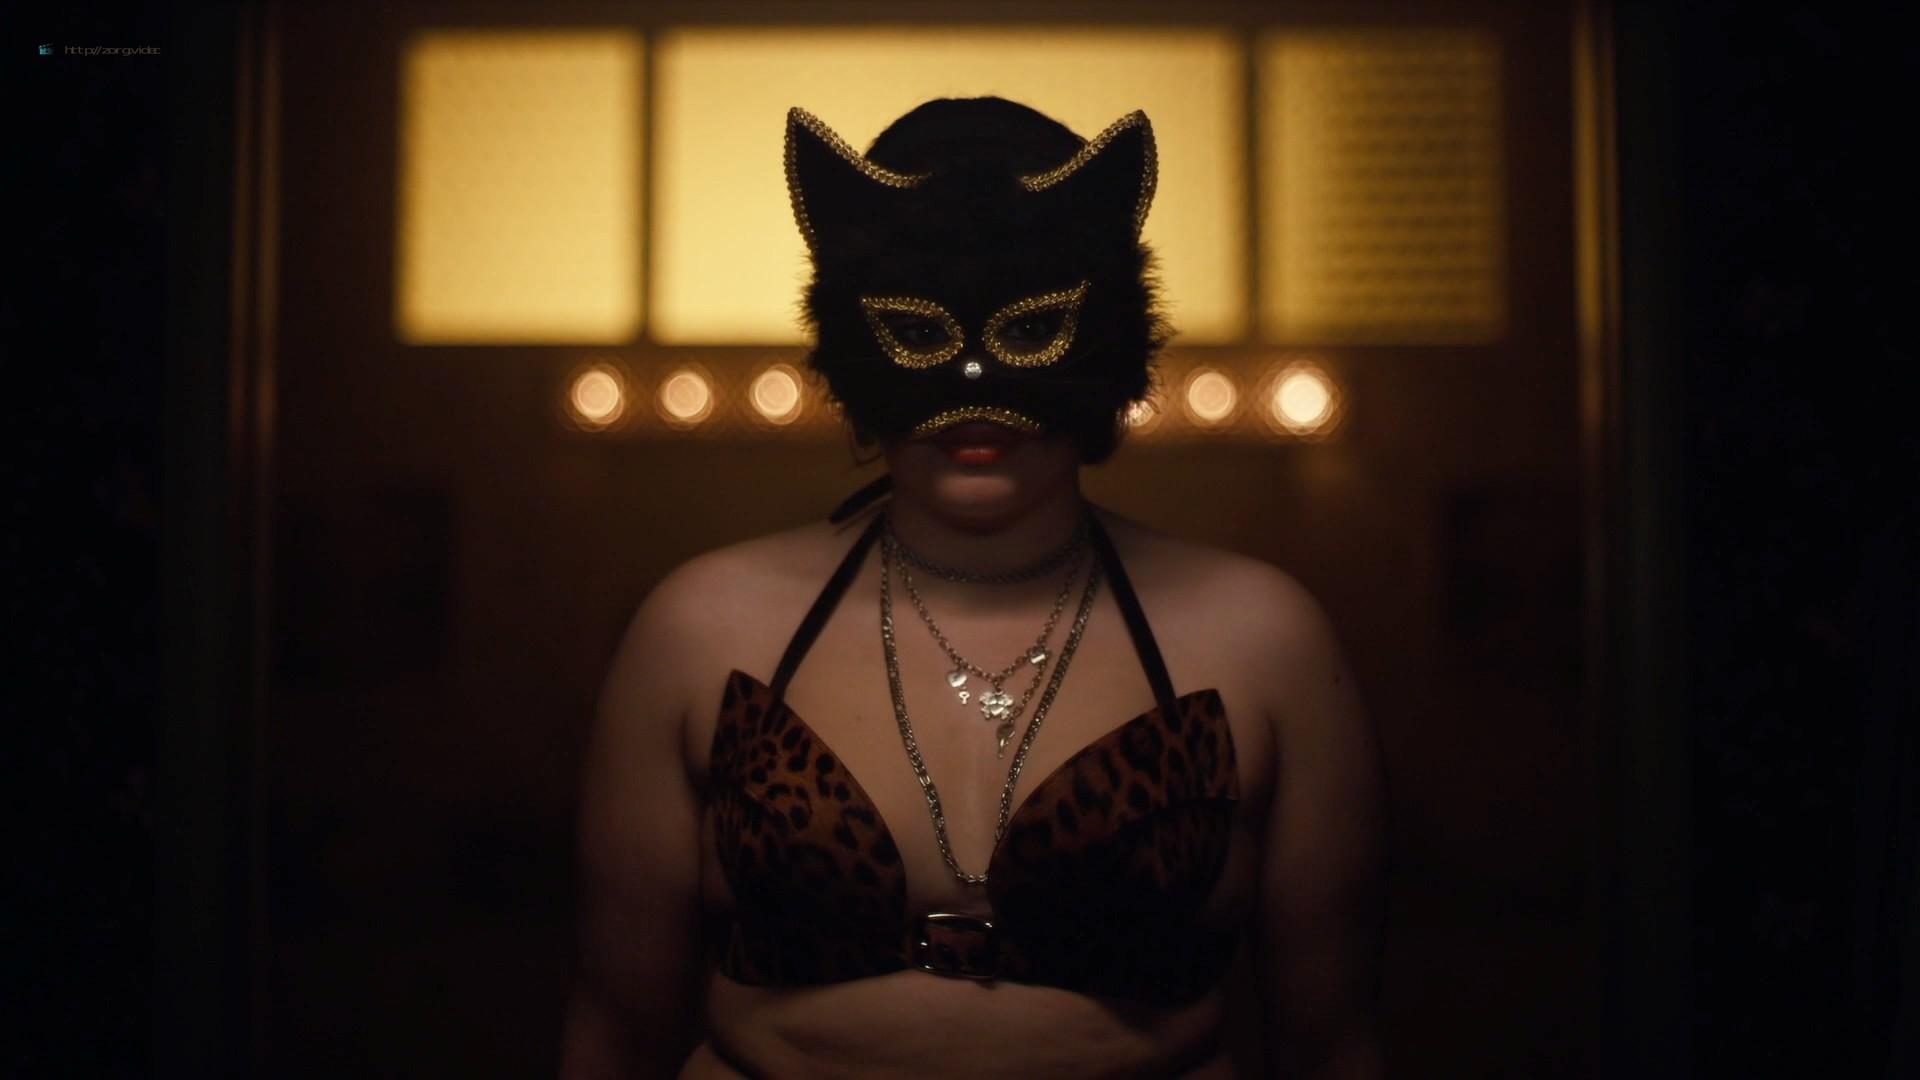 Hunter Schafer nude topless, Sydney Sweeney, Zendaya hot - Euphoria (2019) s1e7 HD 1080p (5)